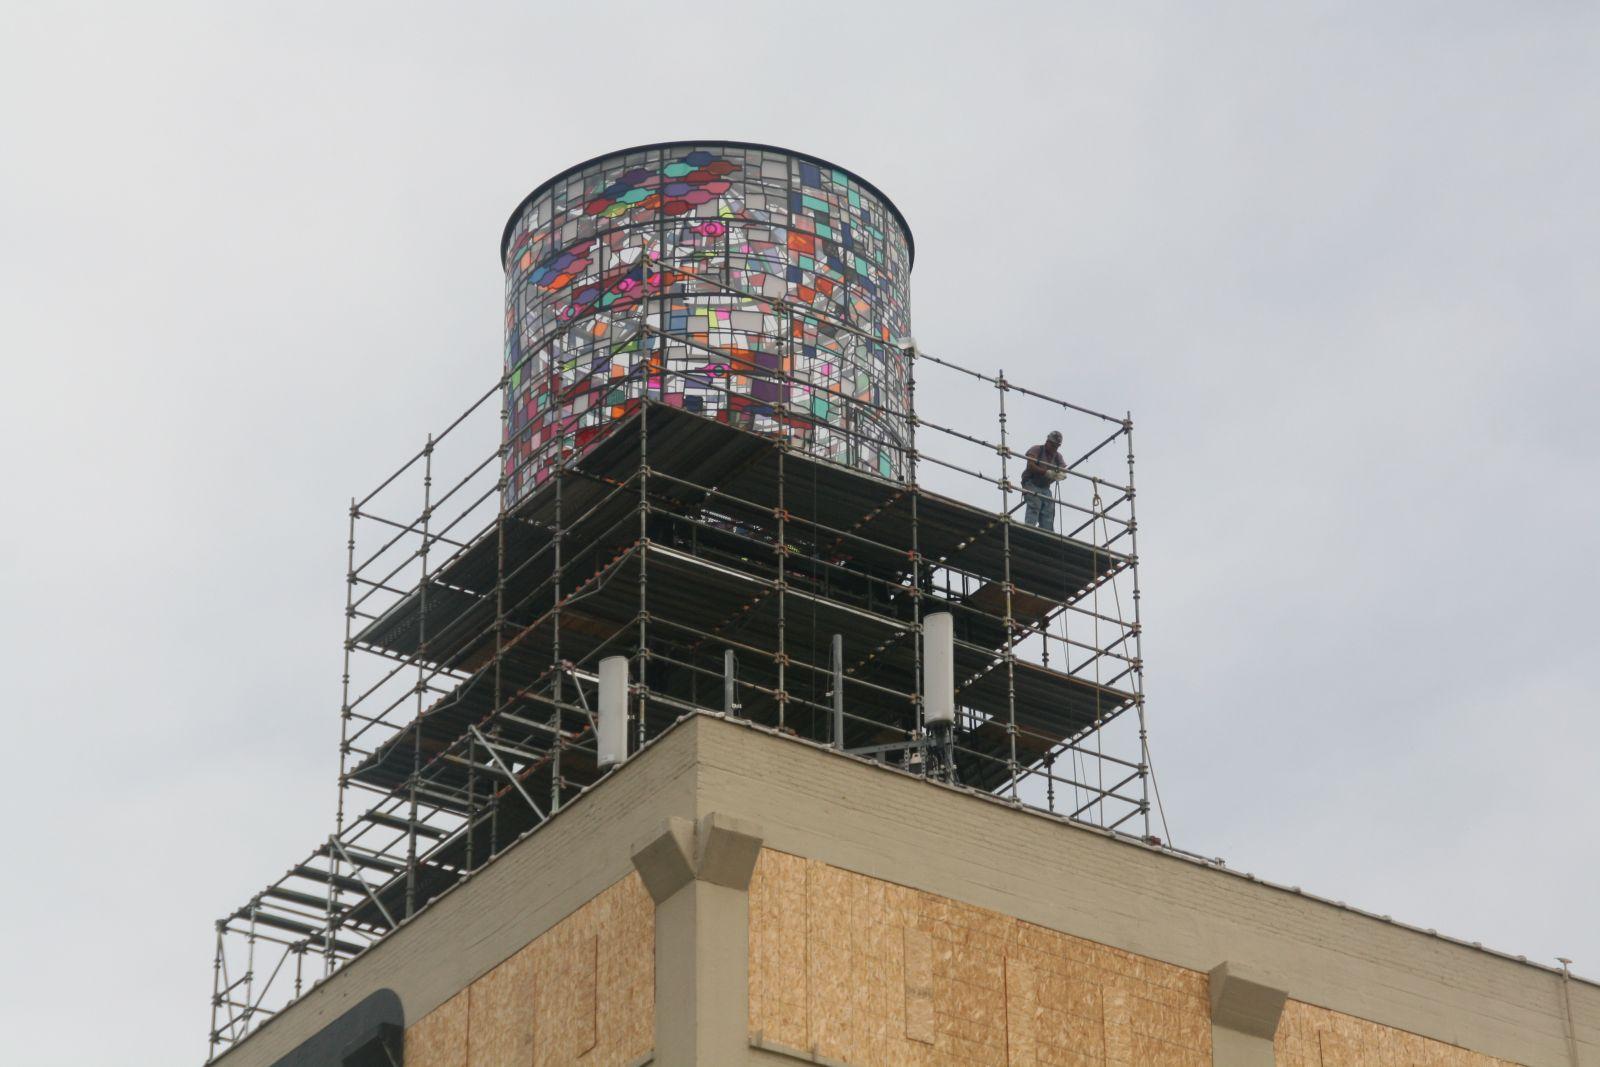 Coakley Water Tower Lift